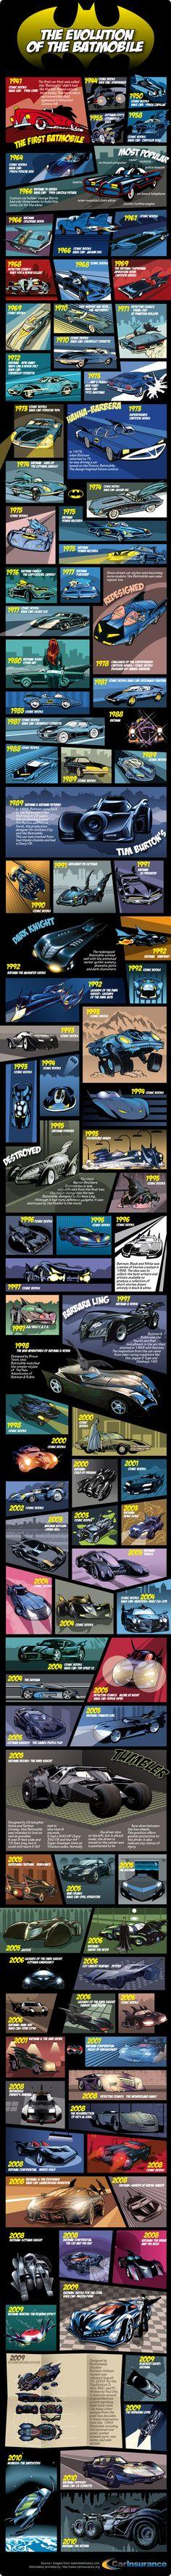 The evolution of the Batmobile.